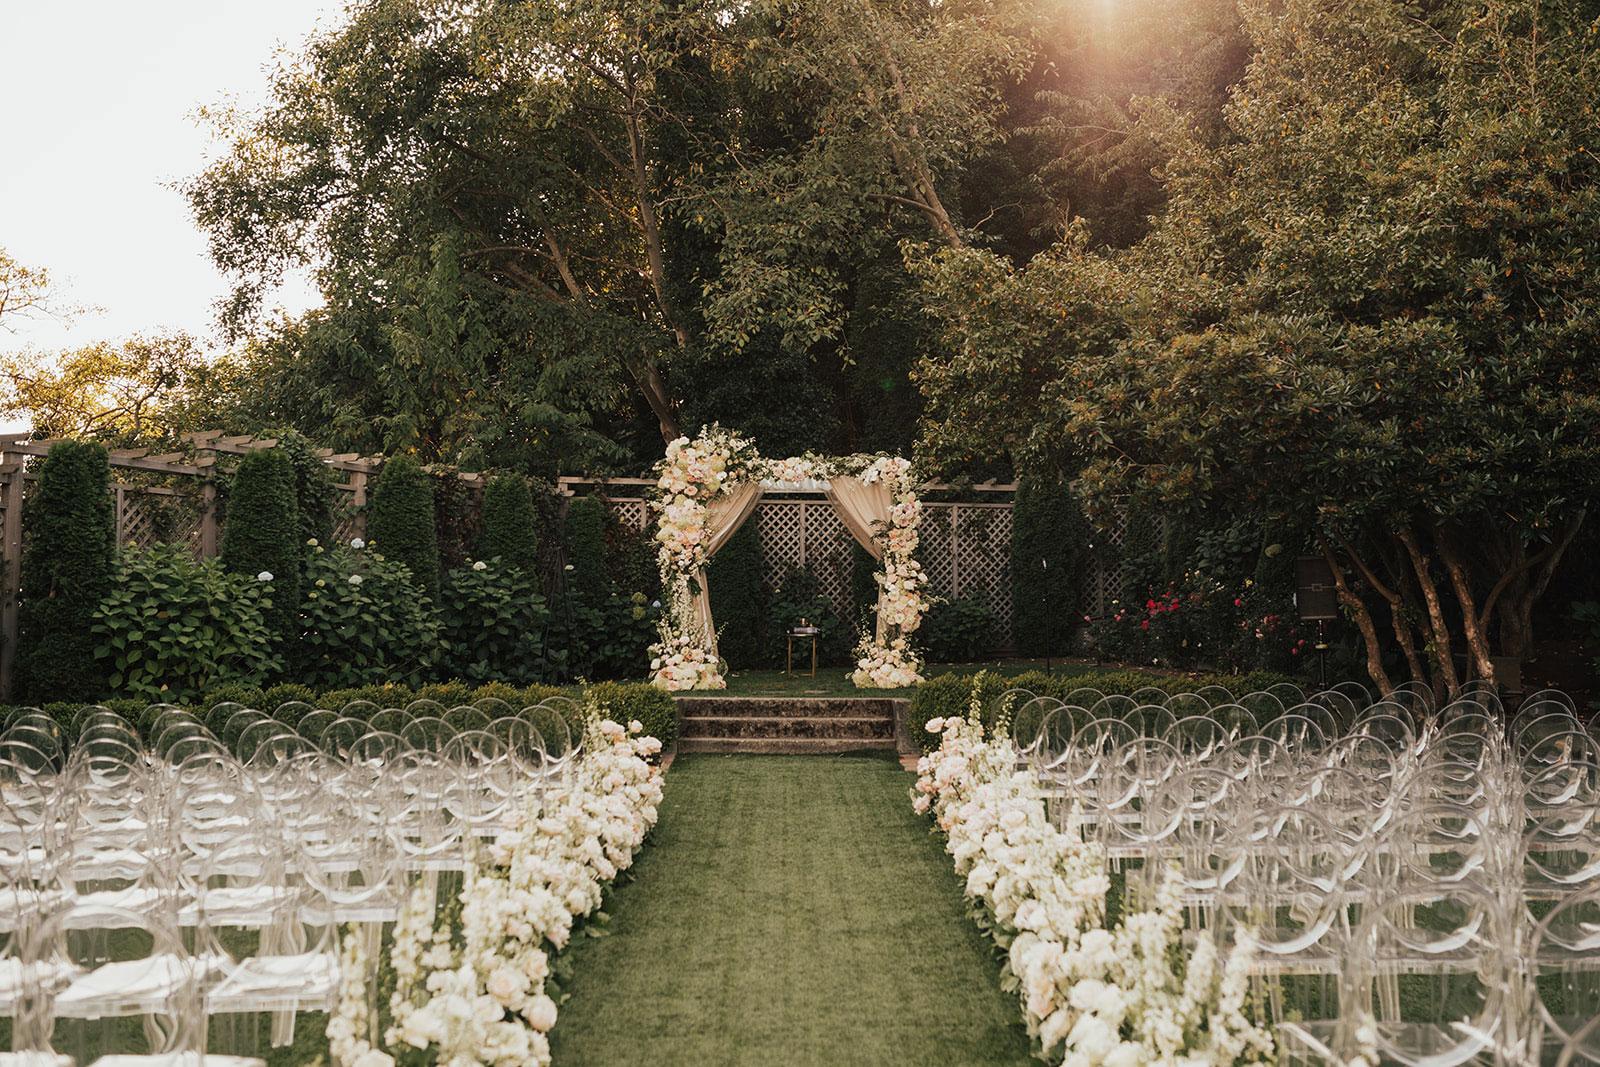 outdoor wedding ceremony in seattle pretty garden backyard setting